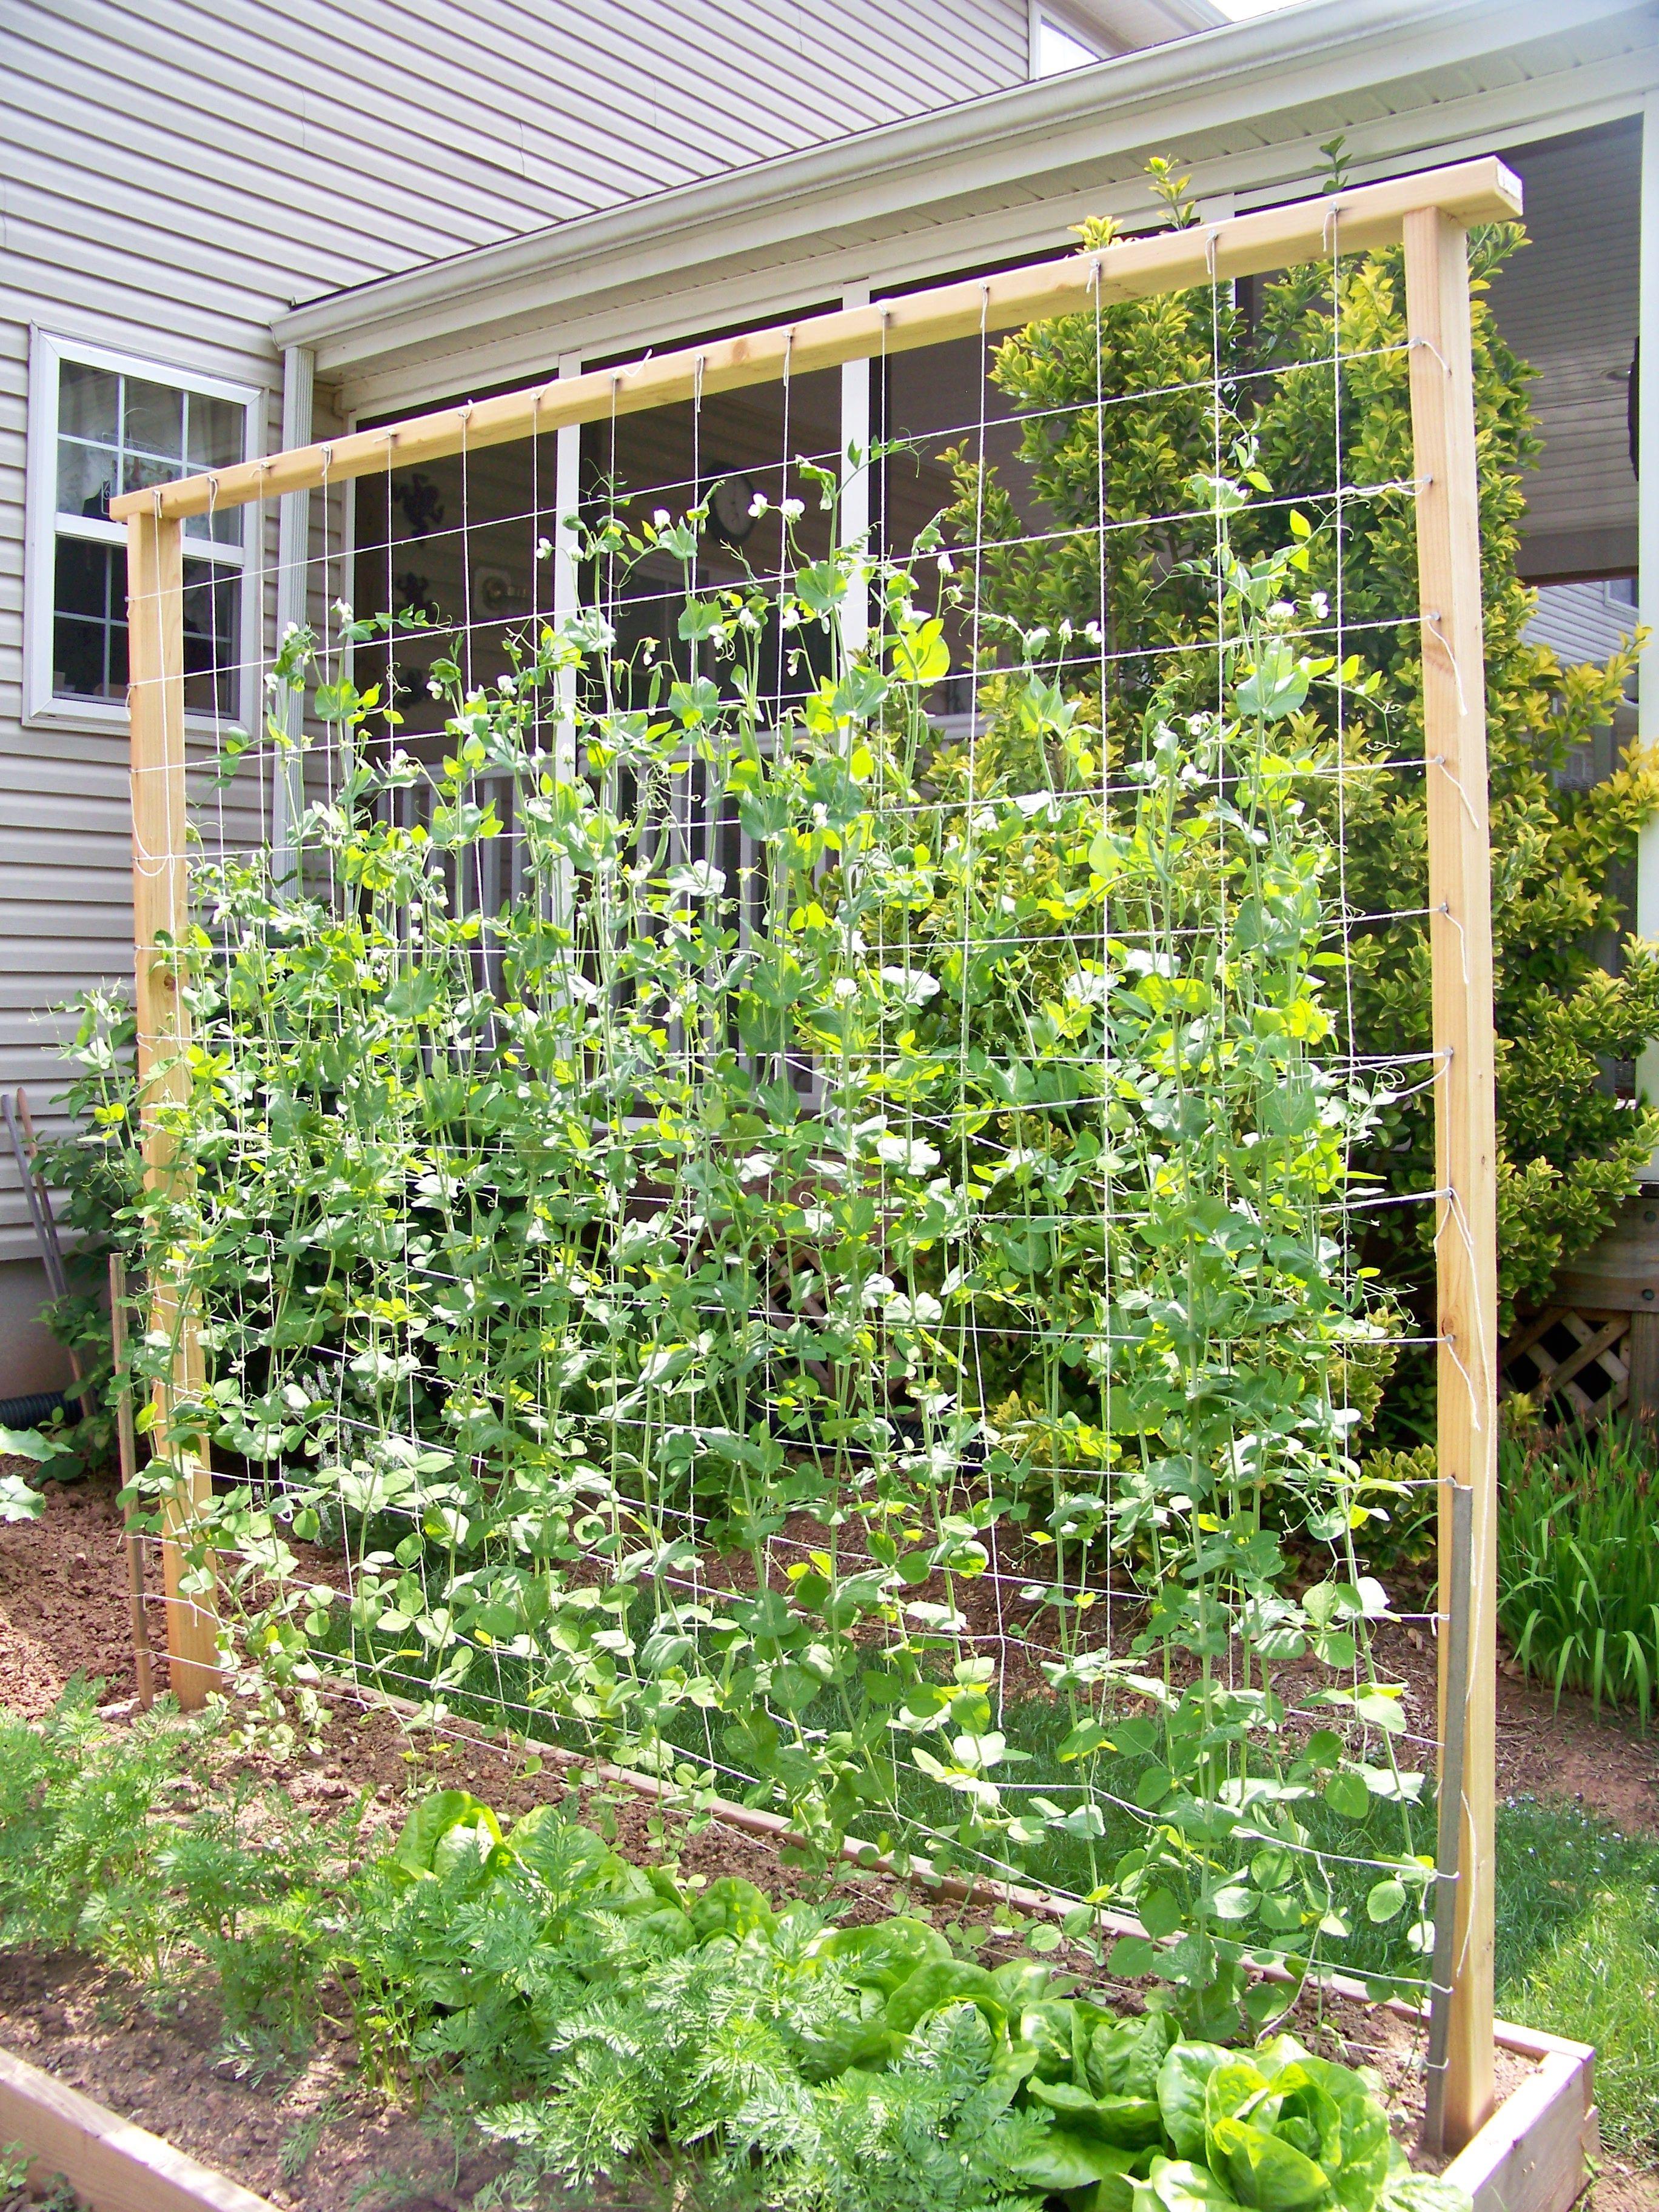 Our 39snap39 pea trellis 7 ft garden vegetable for Vegetable garden trellis